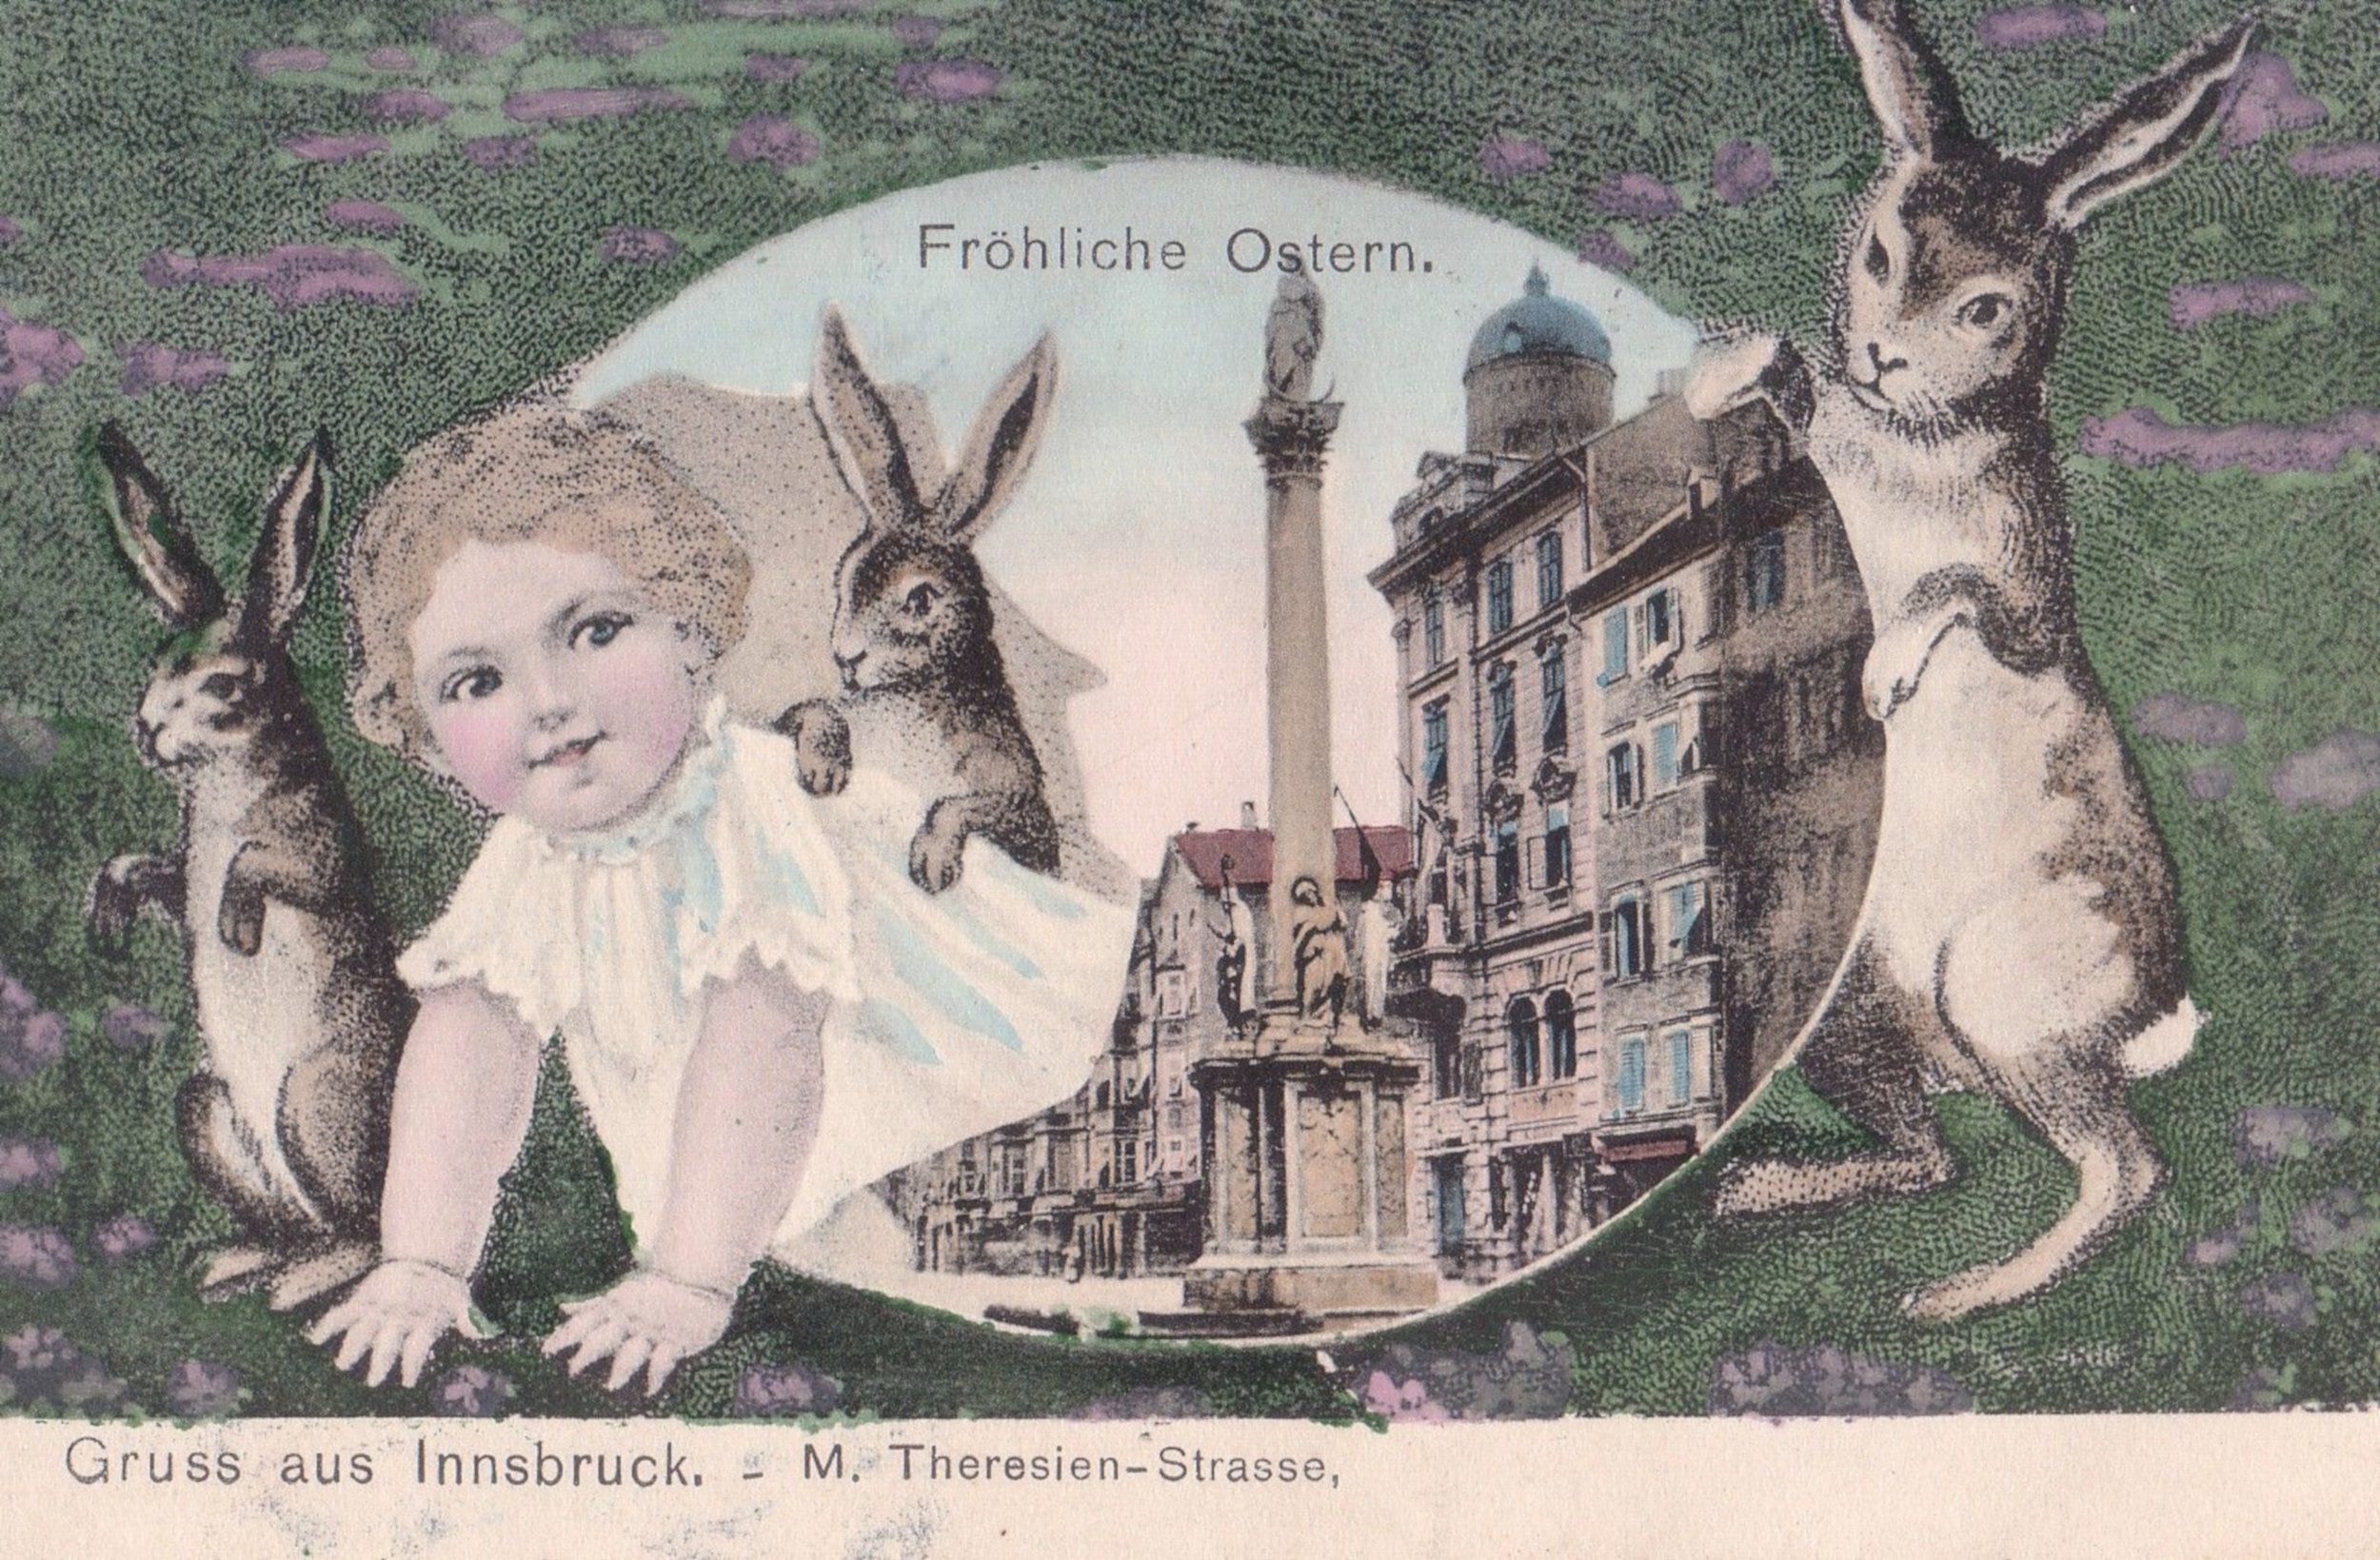 Fröhliche Ostergrüße